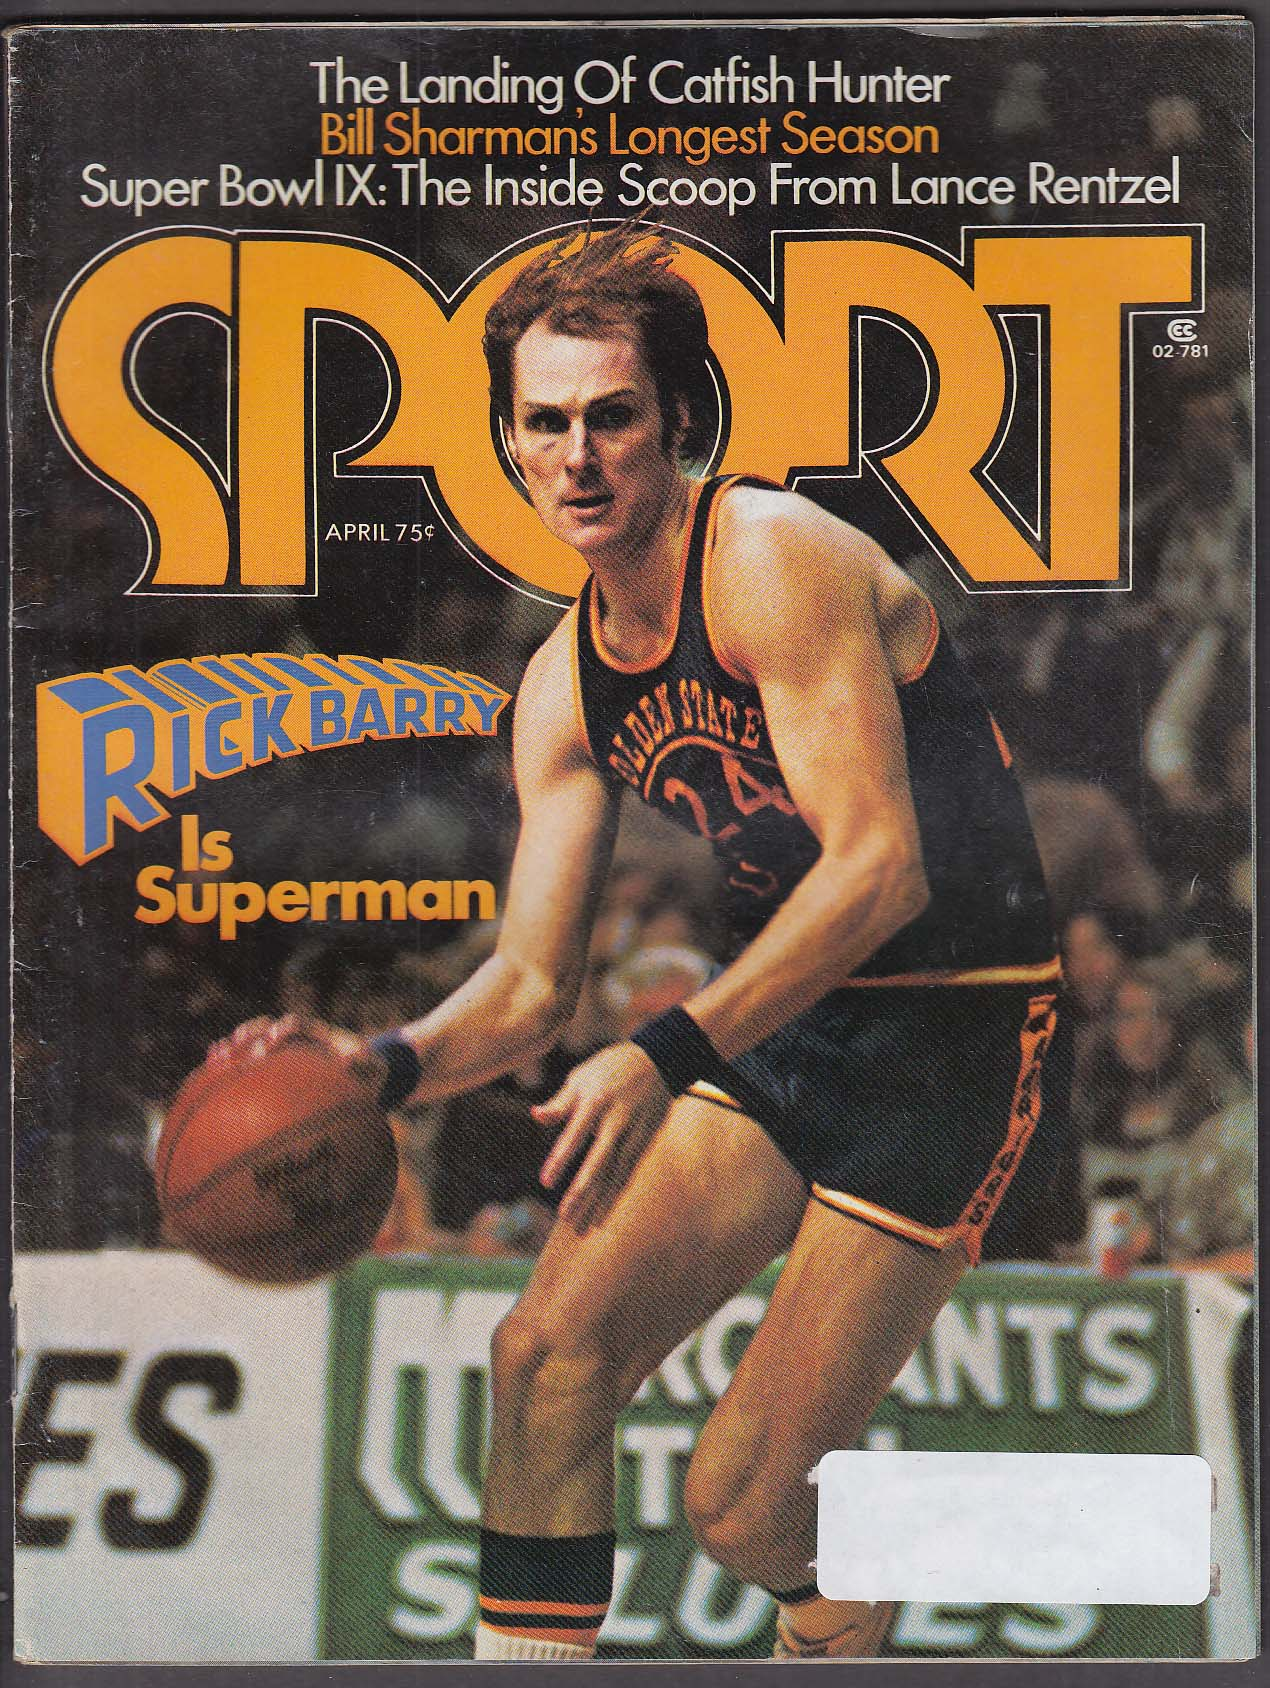 SPORT Rick Barry Catfish Hunter Bill Sharman Lance Rentzel ++ 4 1975